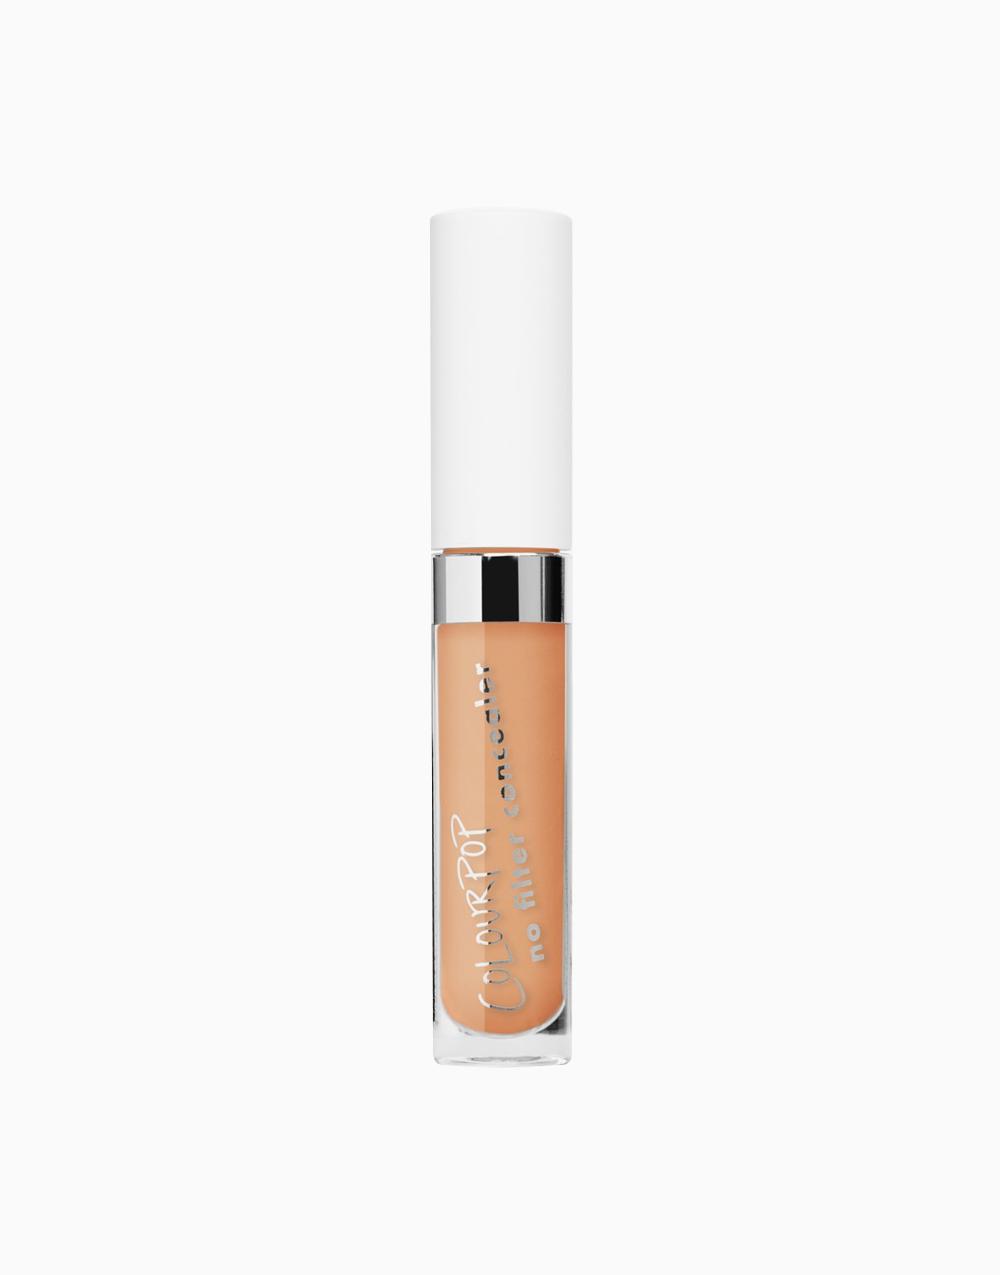 No Filter Matte Concealer by ColourPop | Medium Tan 35